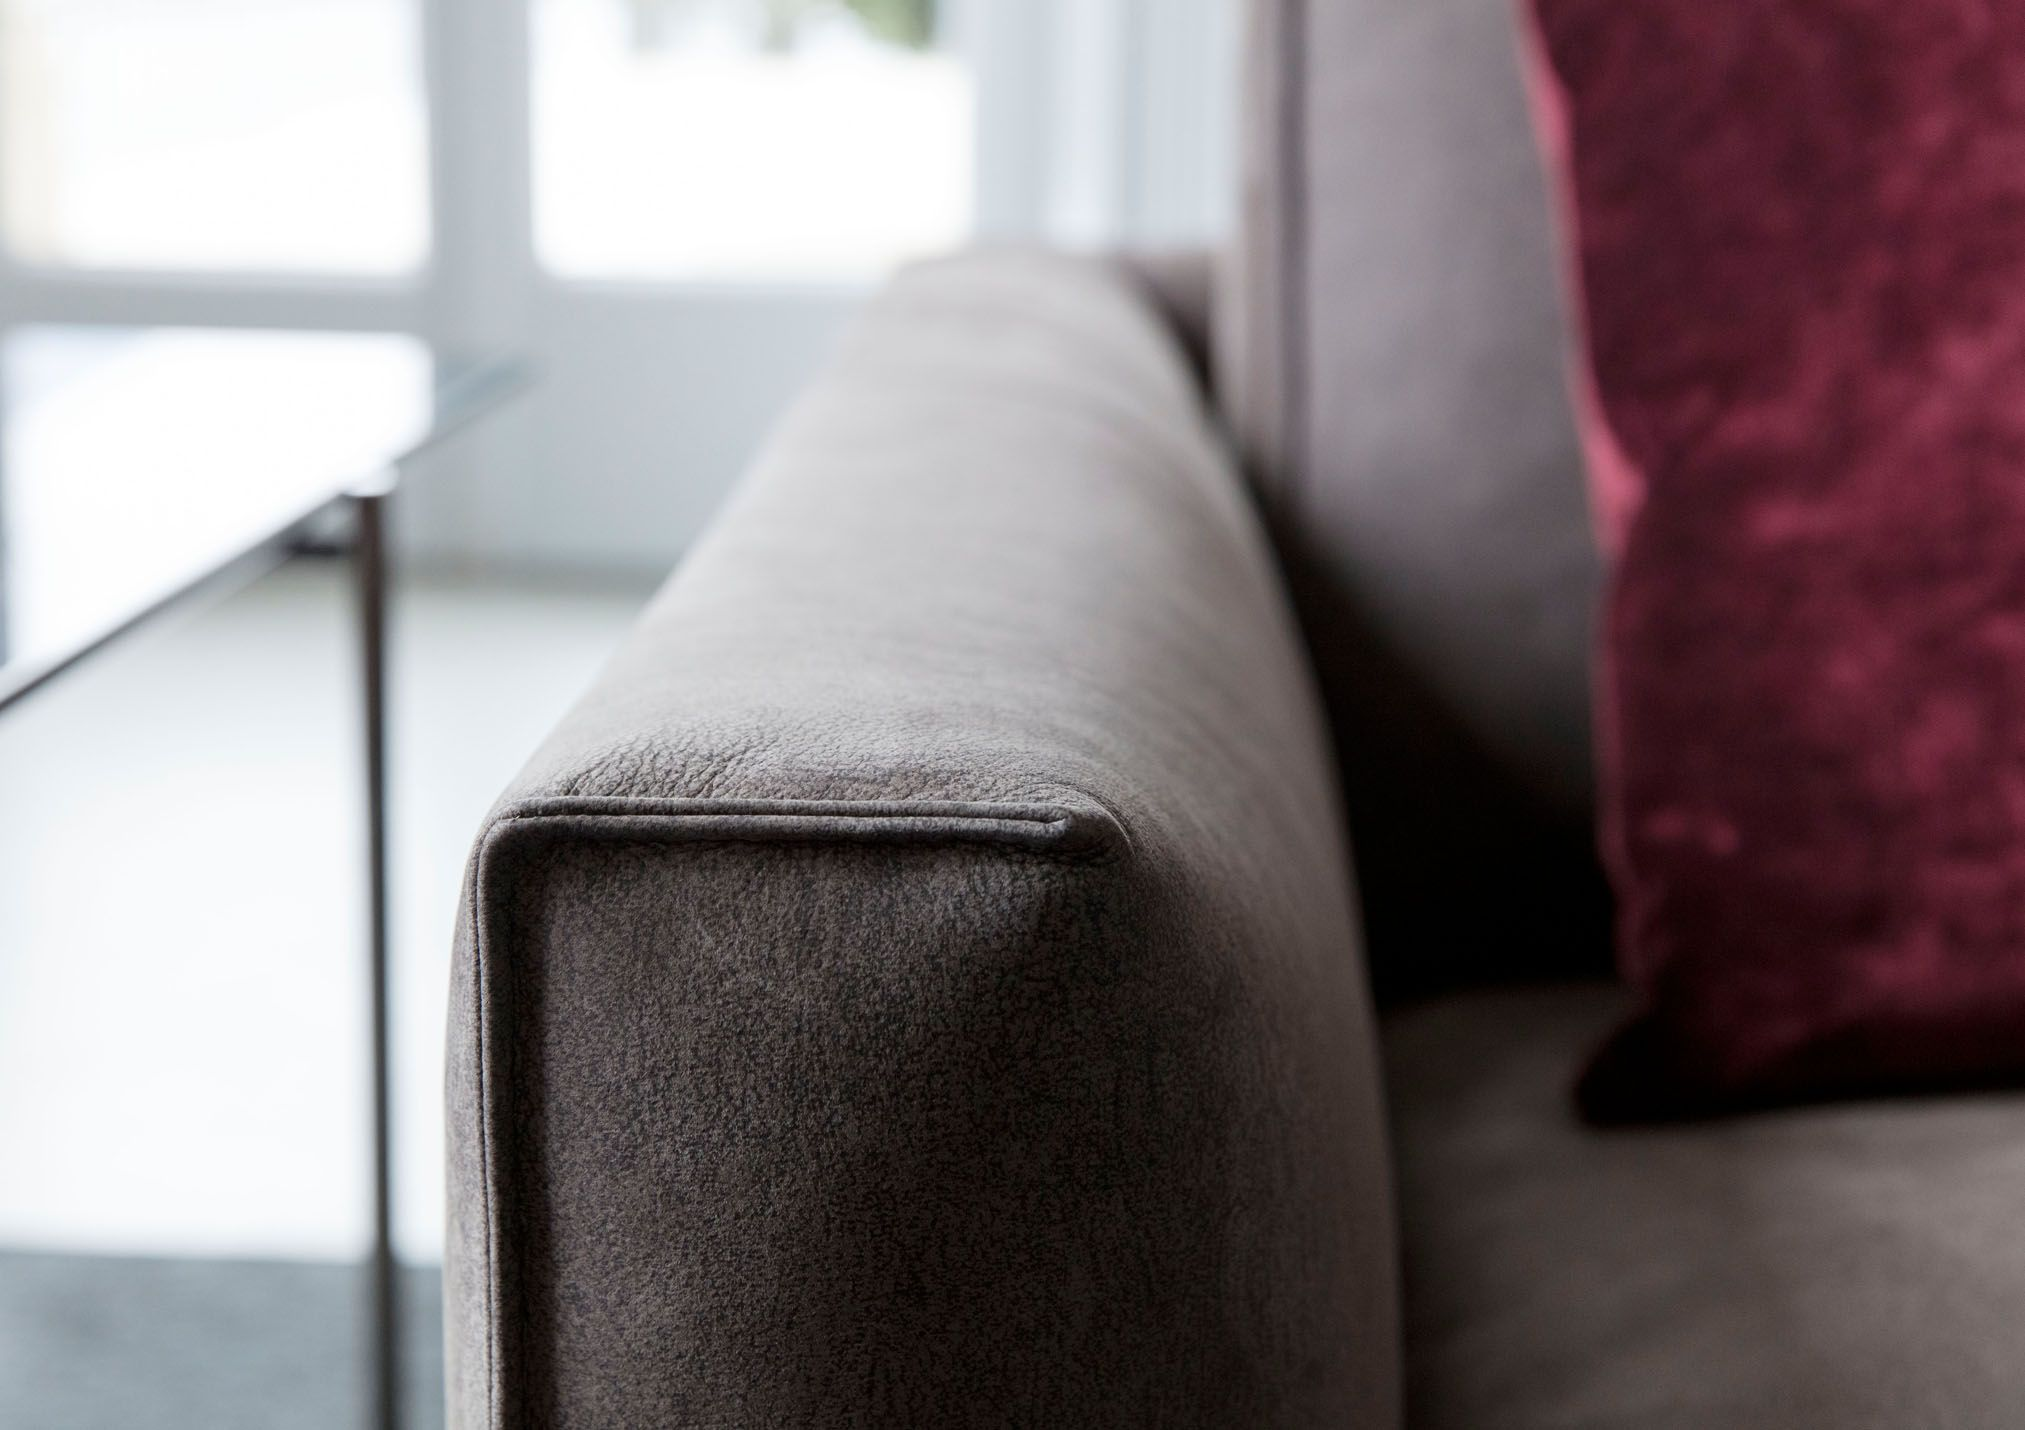 Divani In Pelle Nabuk.Livingroom Divano In Pelle Nabuk Ribot Braccioli Con Cucitura